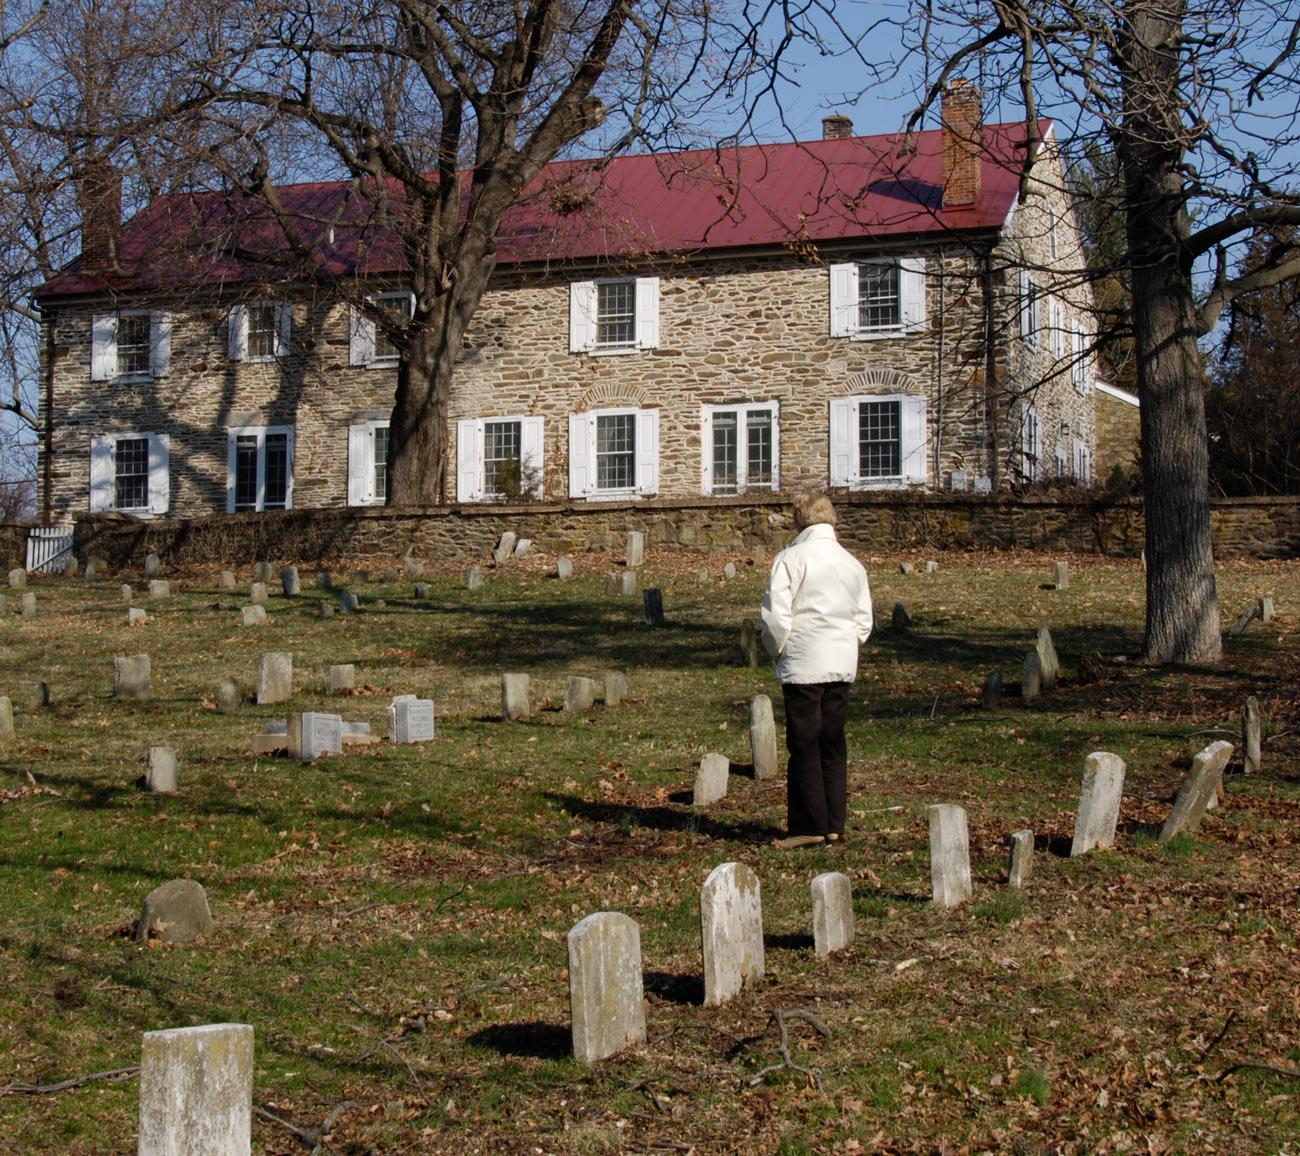 Quaker Meeting House & Cemetery